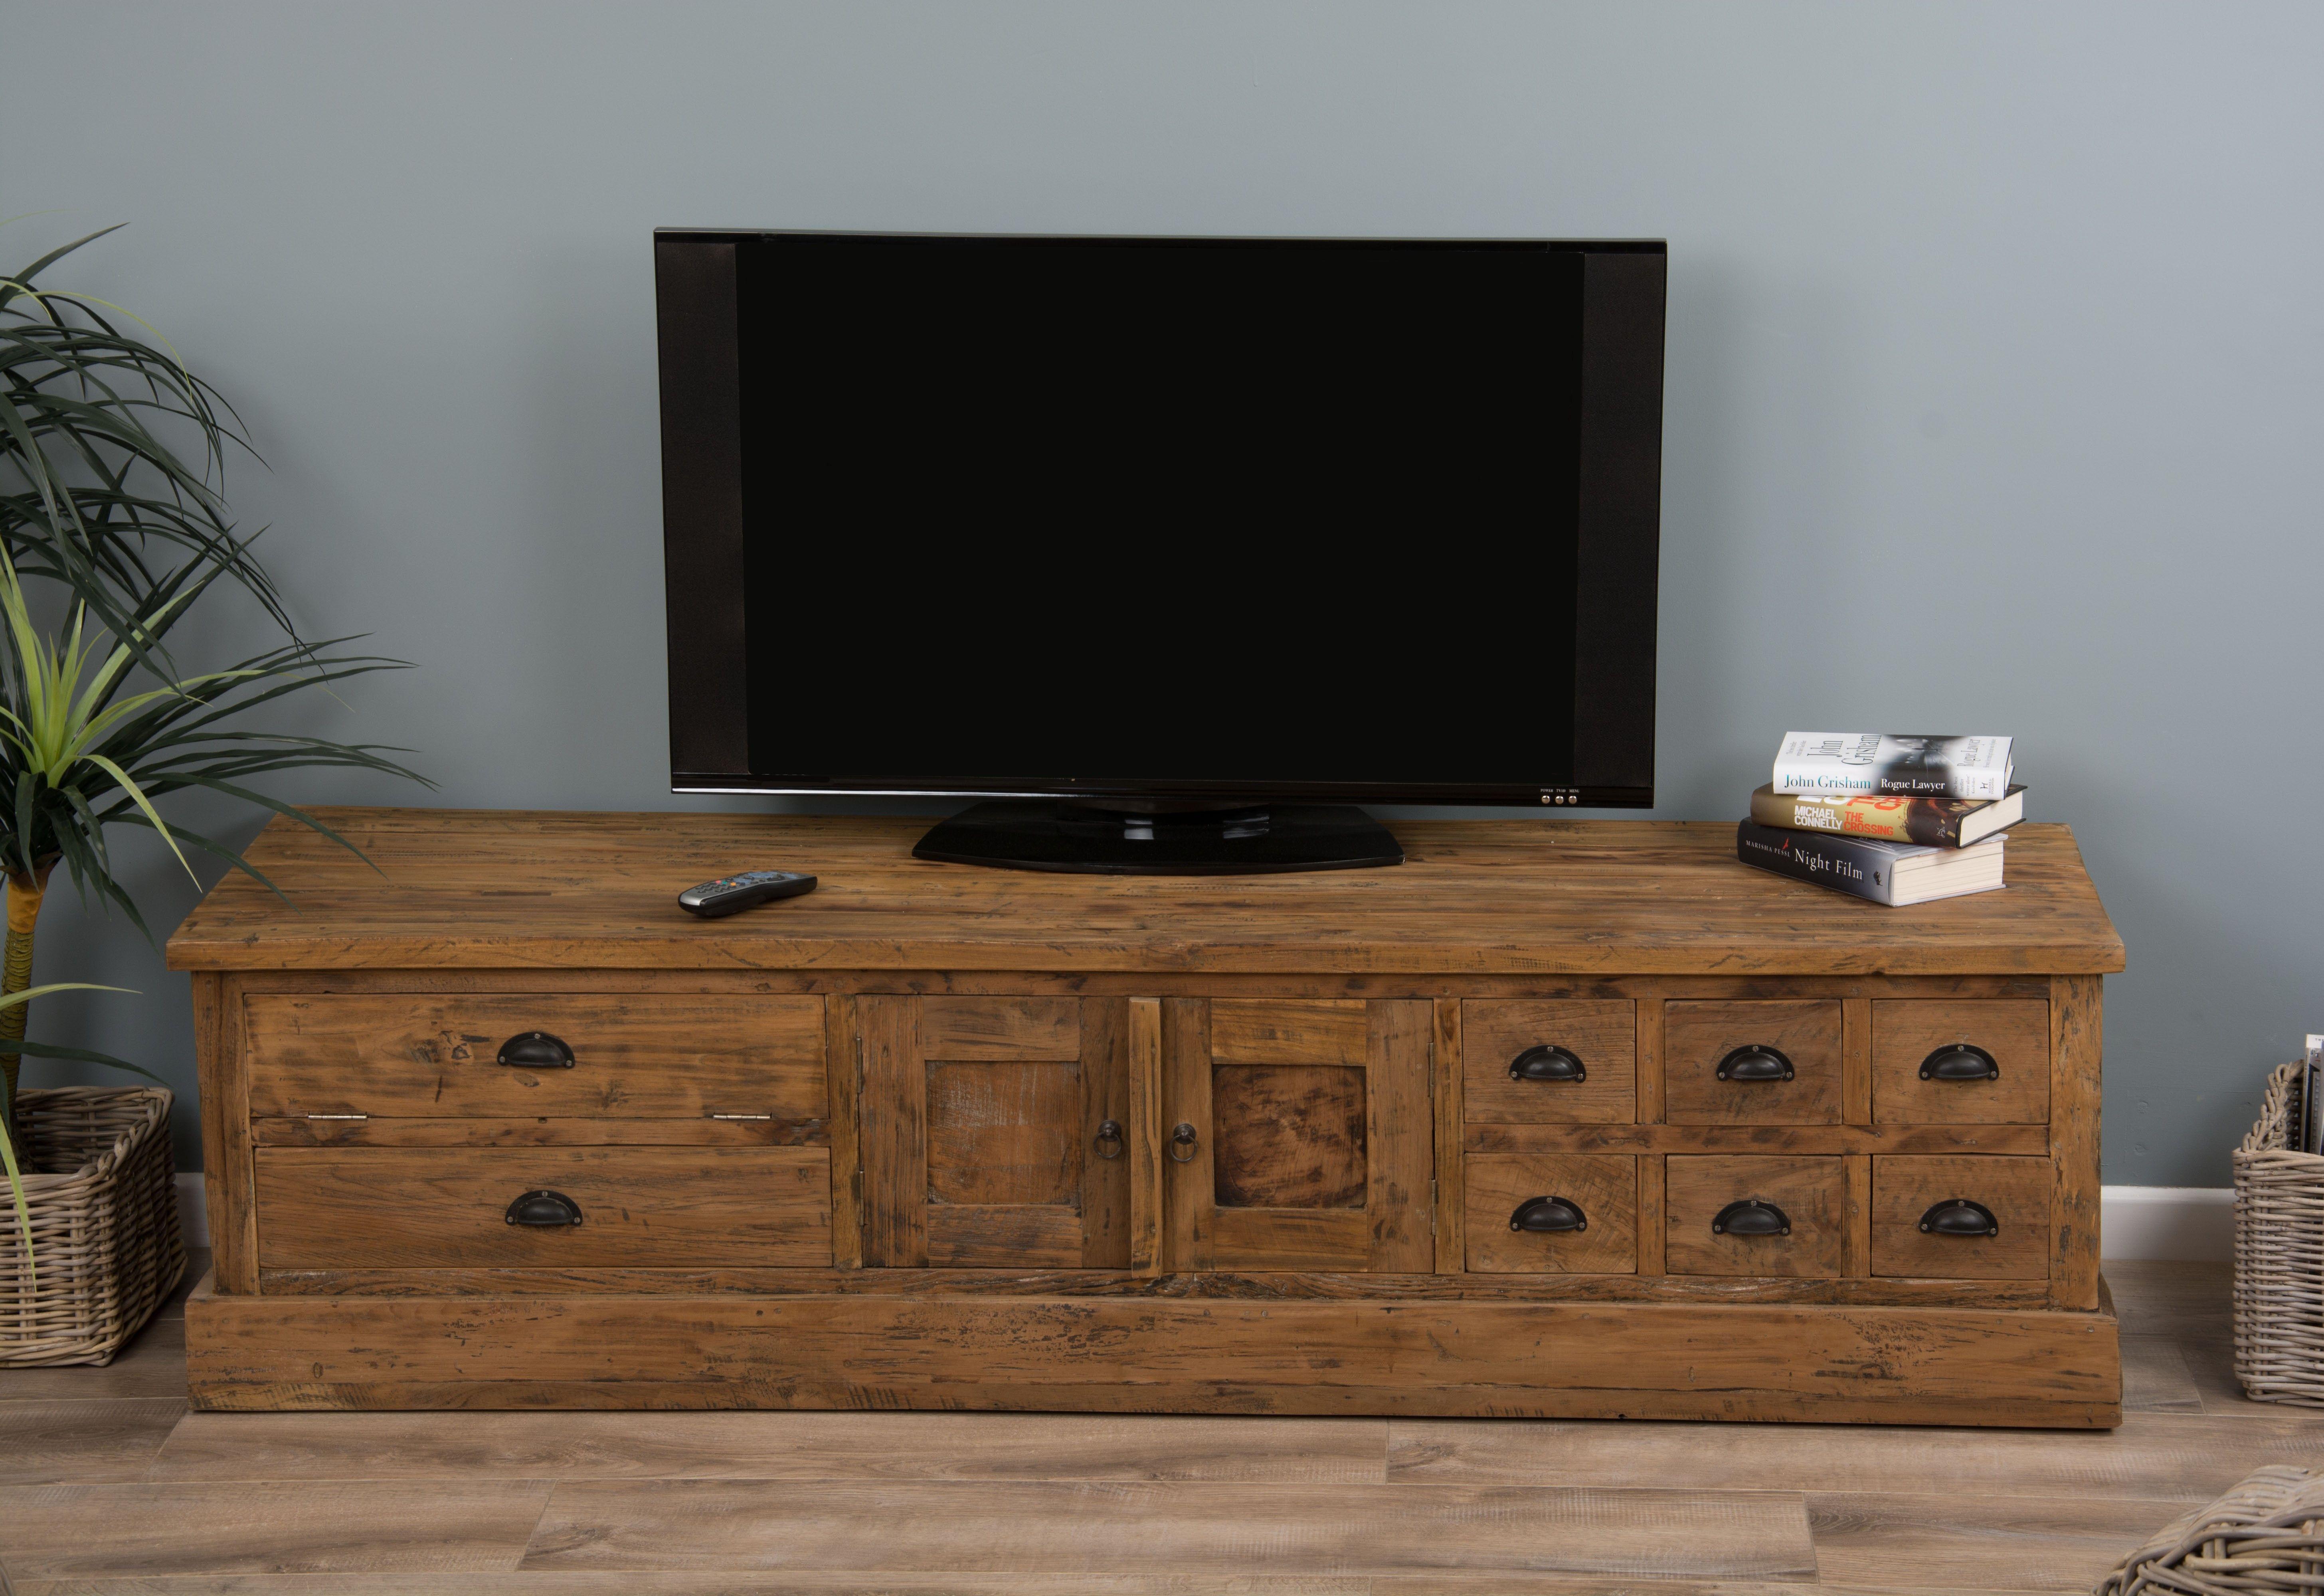 Rustic Reclaimed Teak Tv Cabinet Home Decor Tv Cabinets